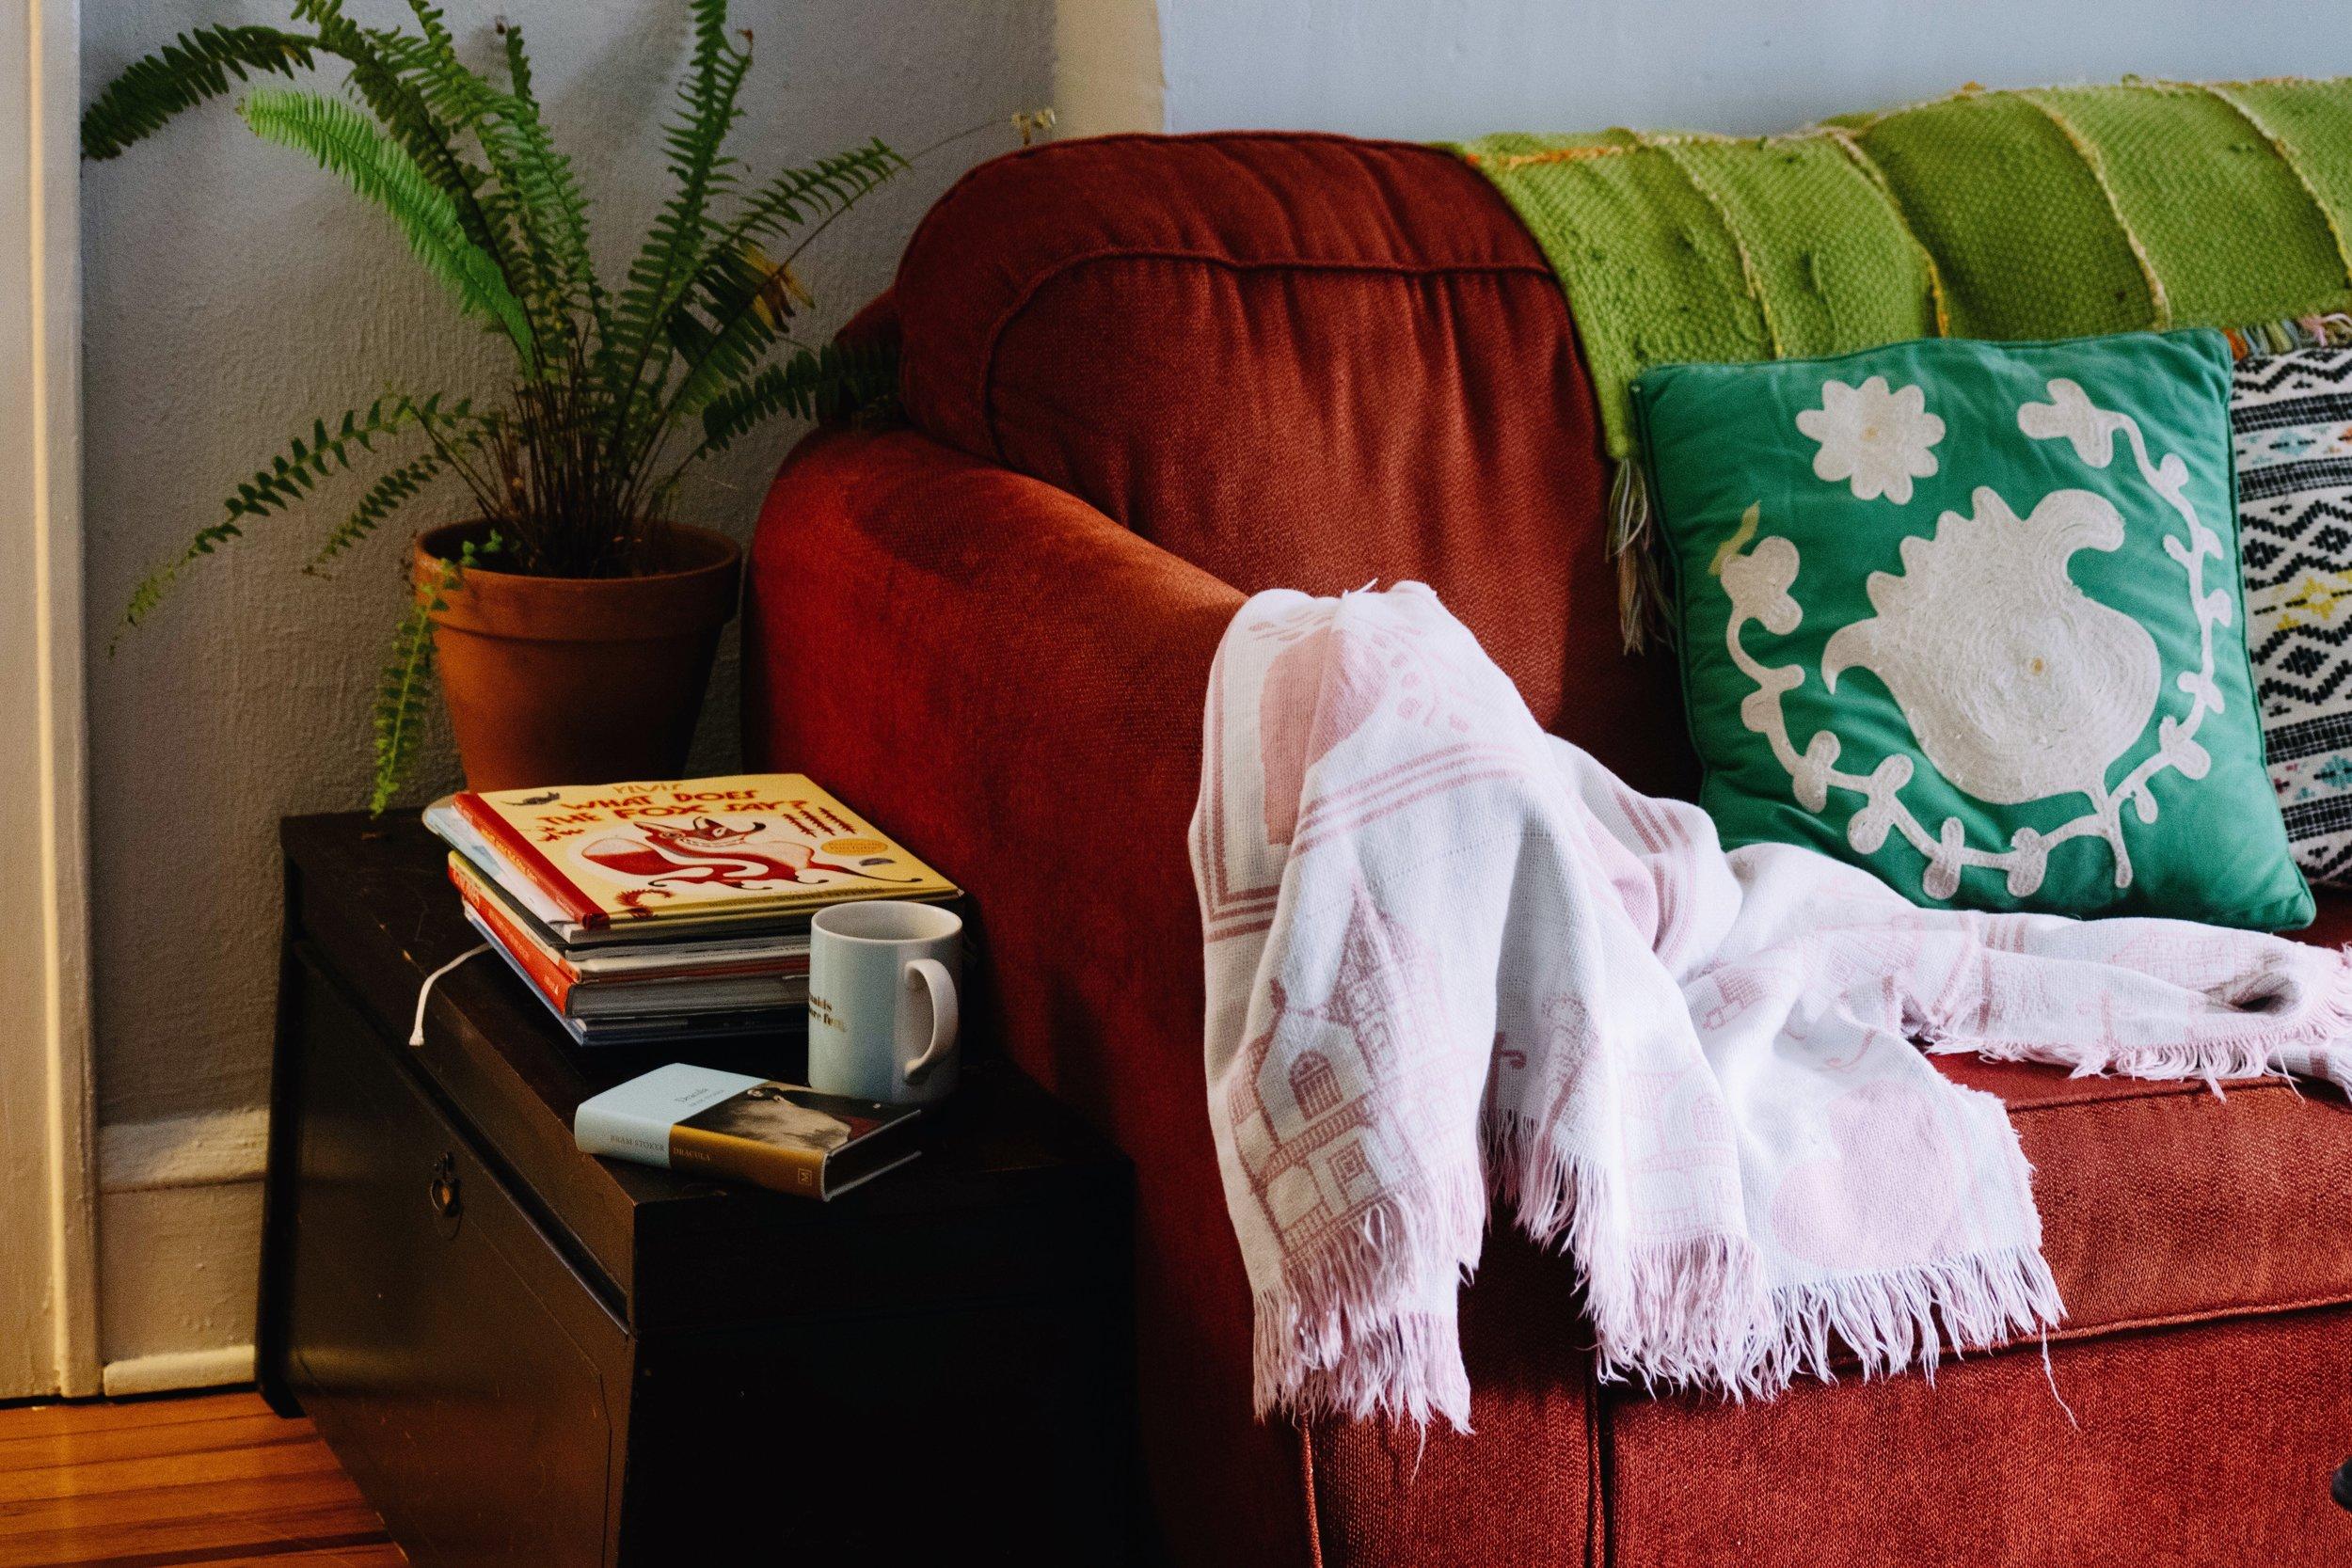 LIVING ROOM (BEFORE & AFTER) (Via: JacinthaPayne.com)